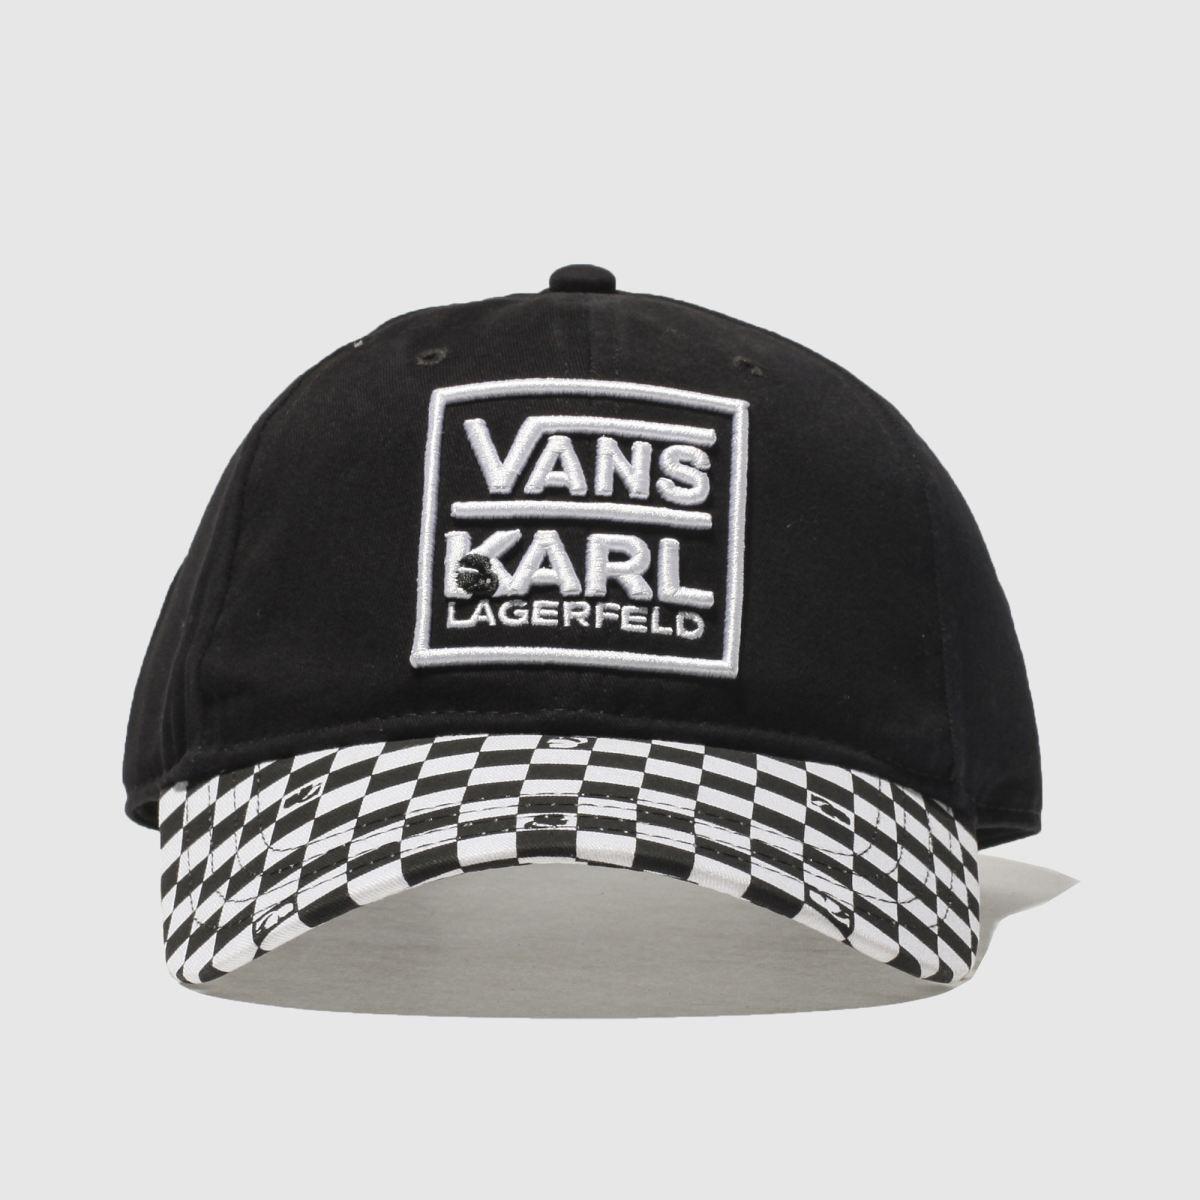 vans black & white karl lagerfeld dugout hat